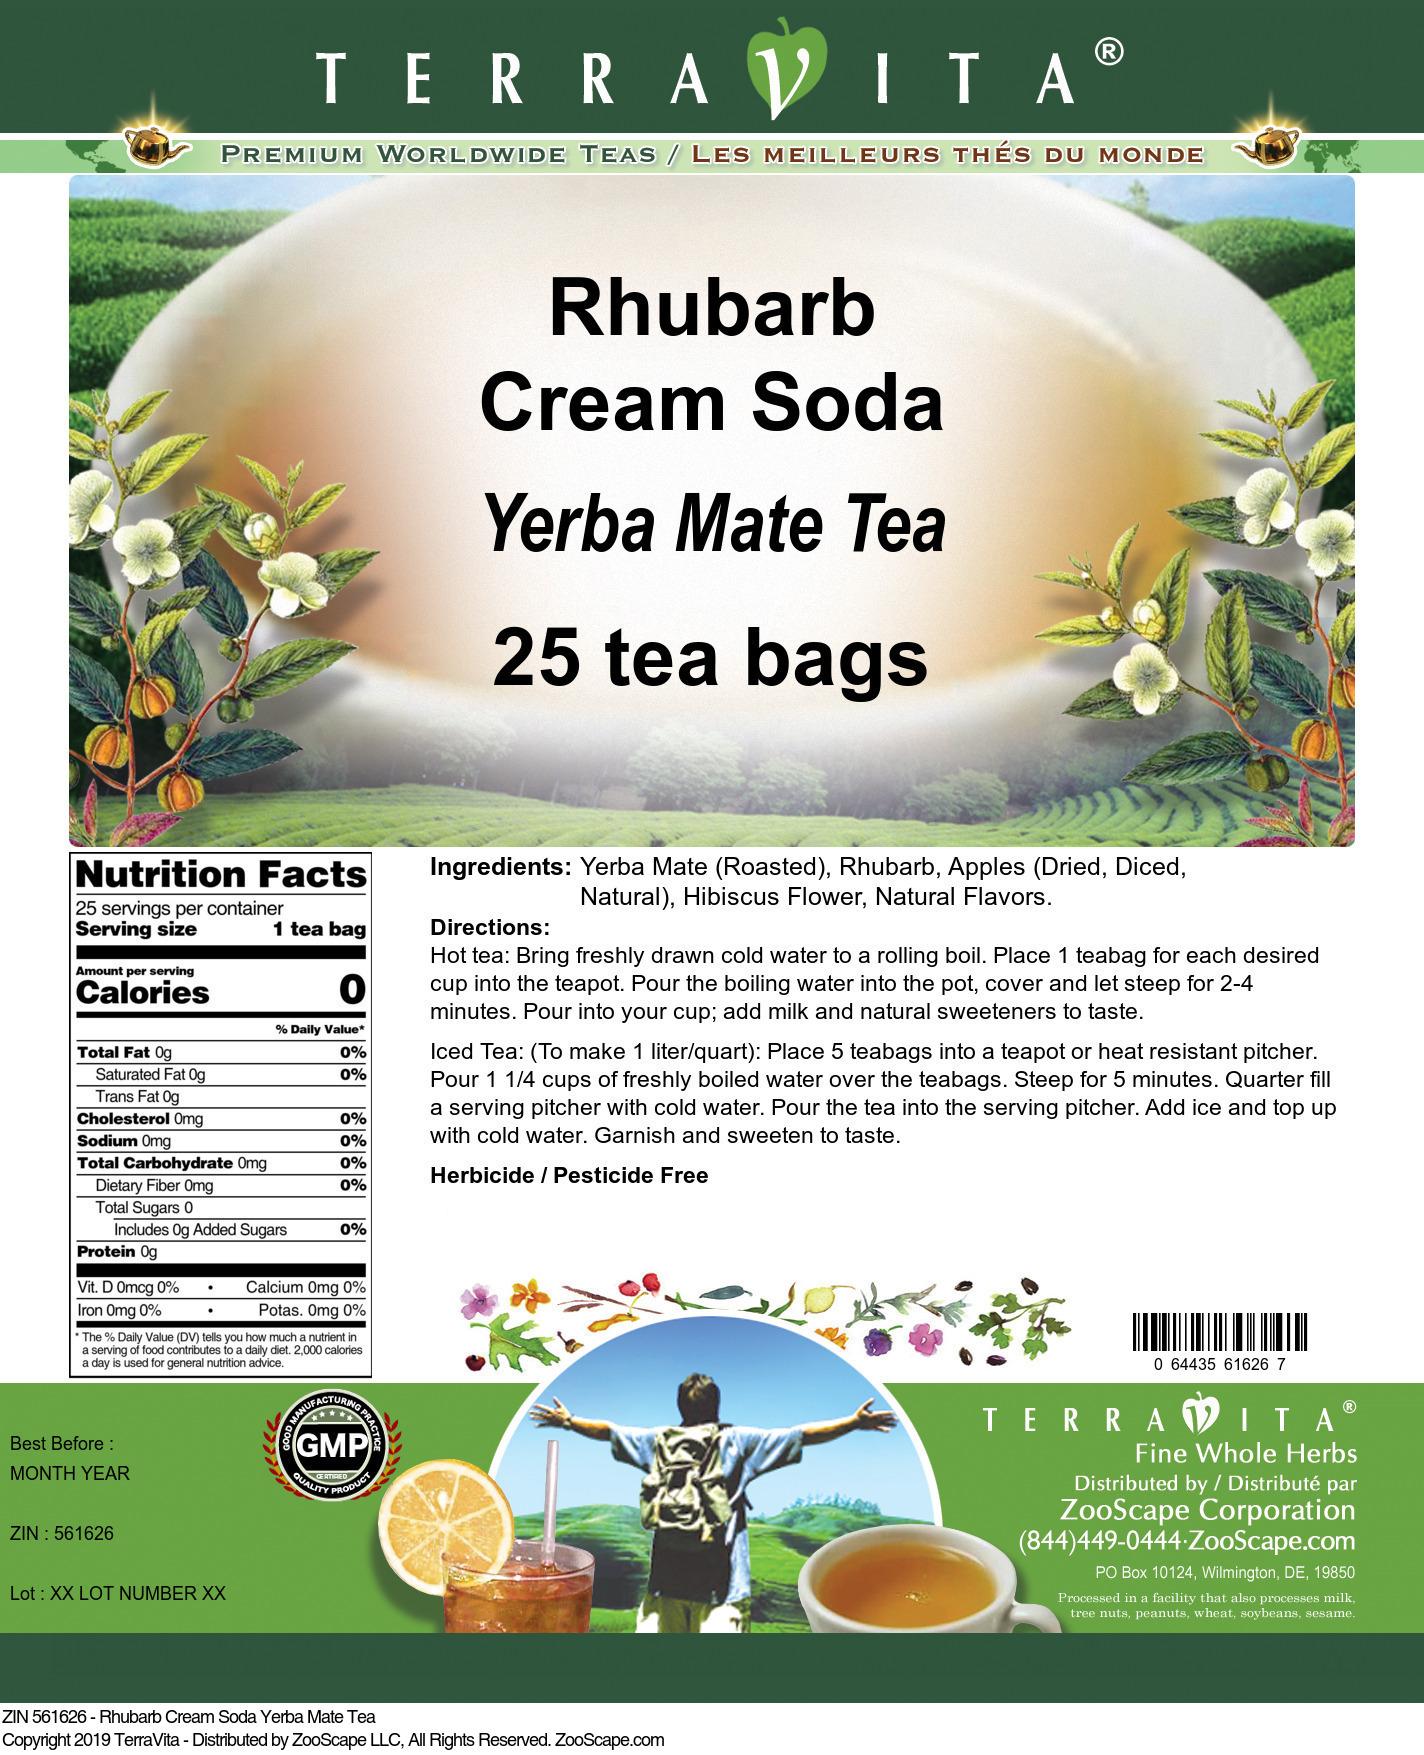 Rhubarb Cream Soda Yerba Mate Tea